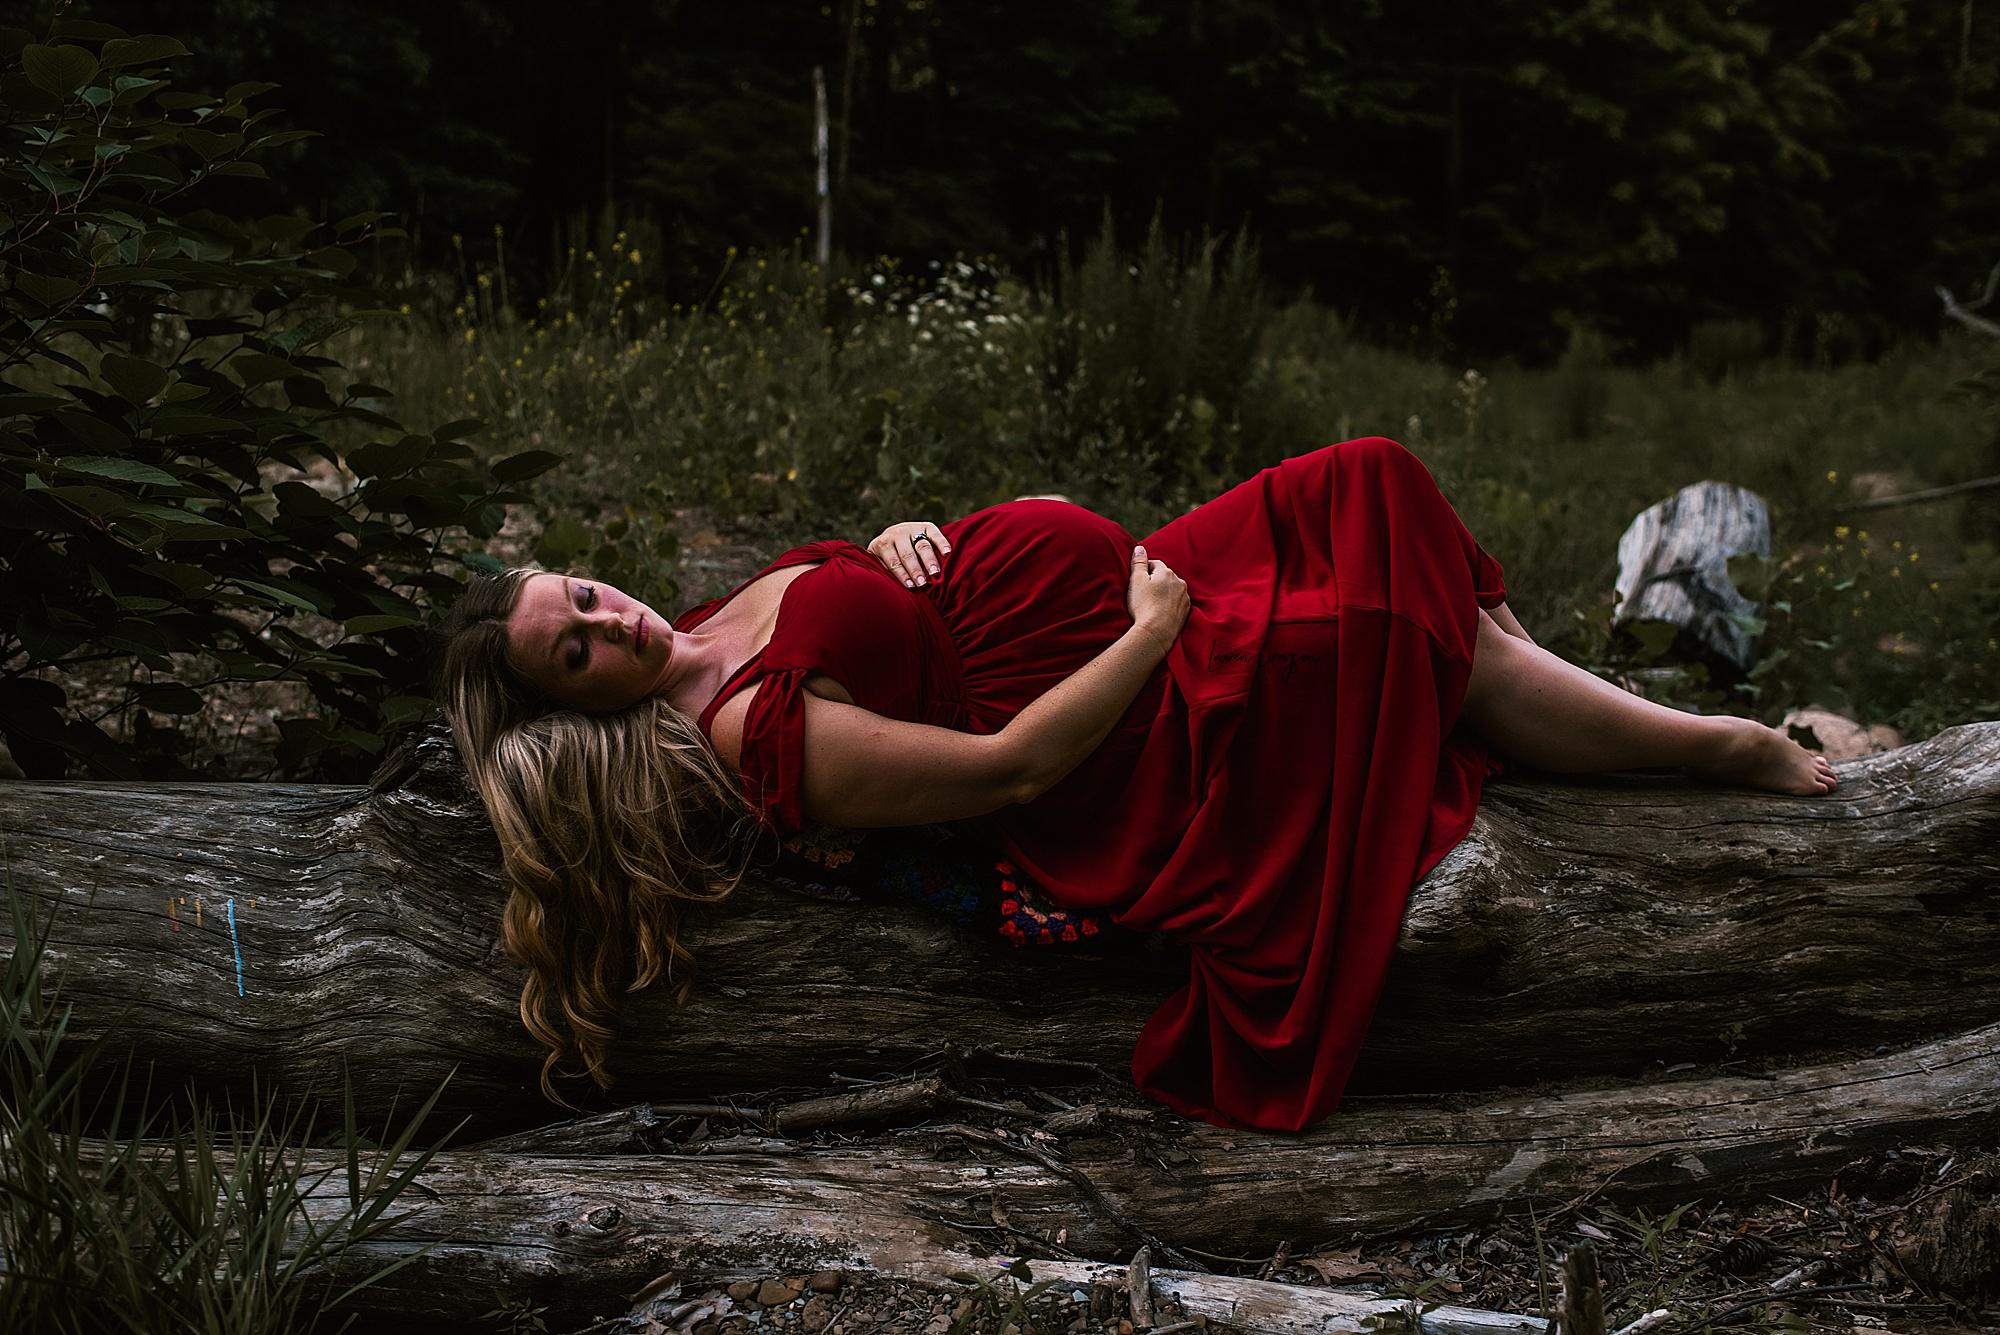 lauren-grayson-photography-akron-ohio-maternity-photographer-waterfall-sarah-f_0019.jpg